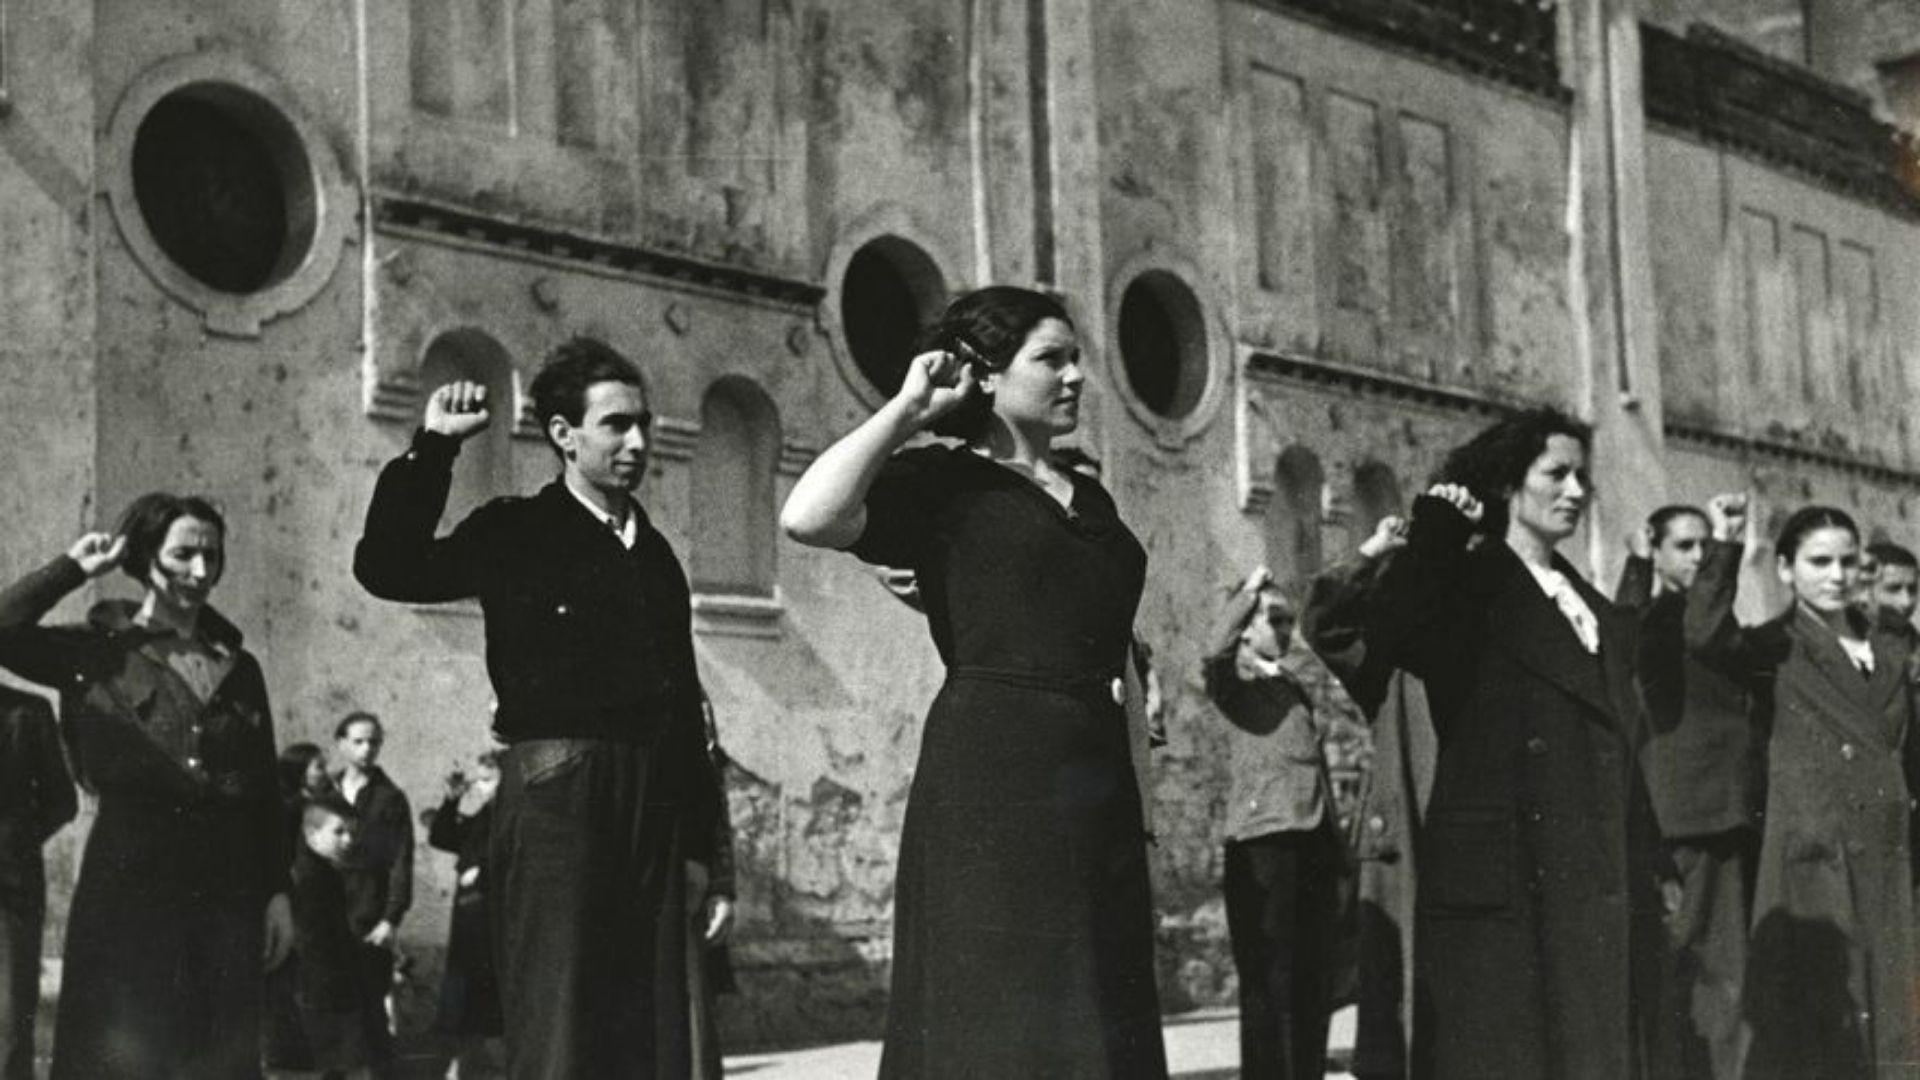 Miembros de las Juventudes Socialistas Unificadas en Gijón, en marzo de 1937